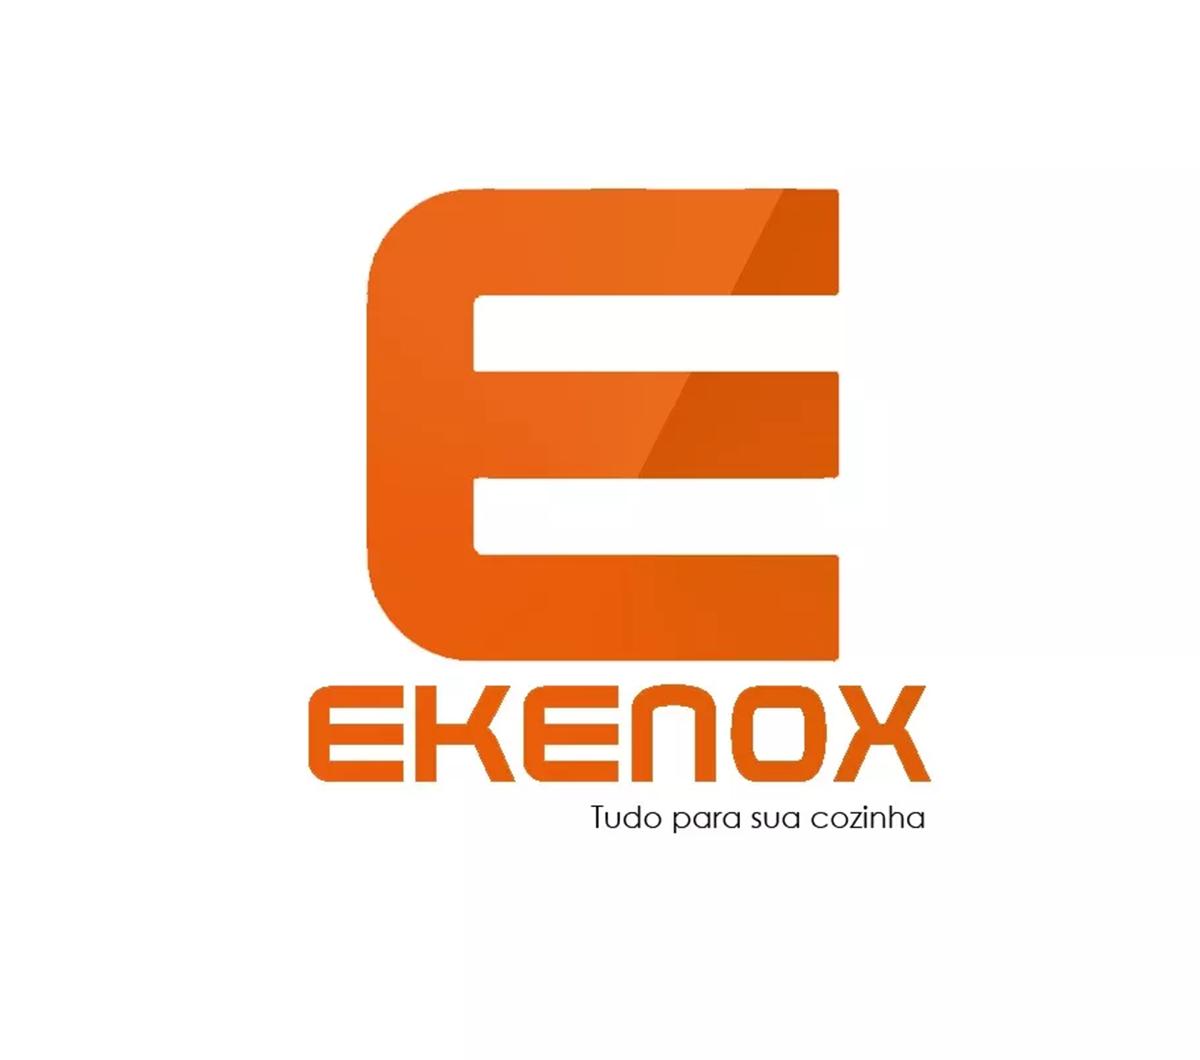 Liquidificador Industrial Alta Rotação 2L Ekenox  - EKENOX- Equipamentos Industriais